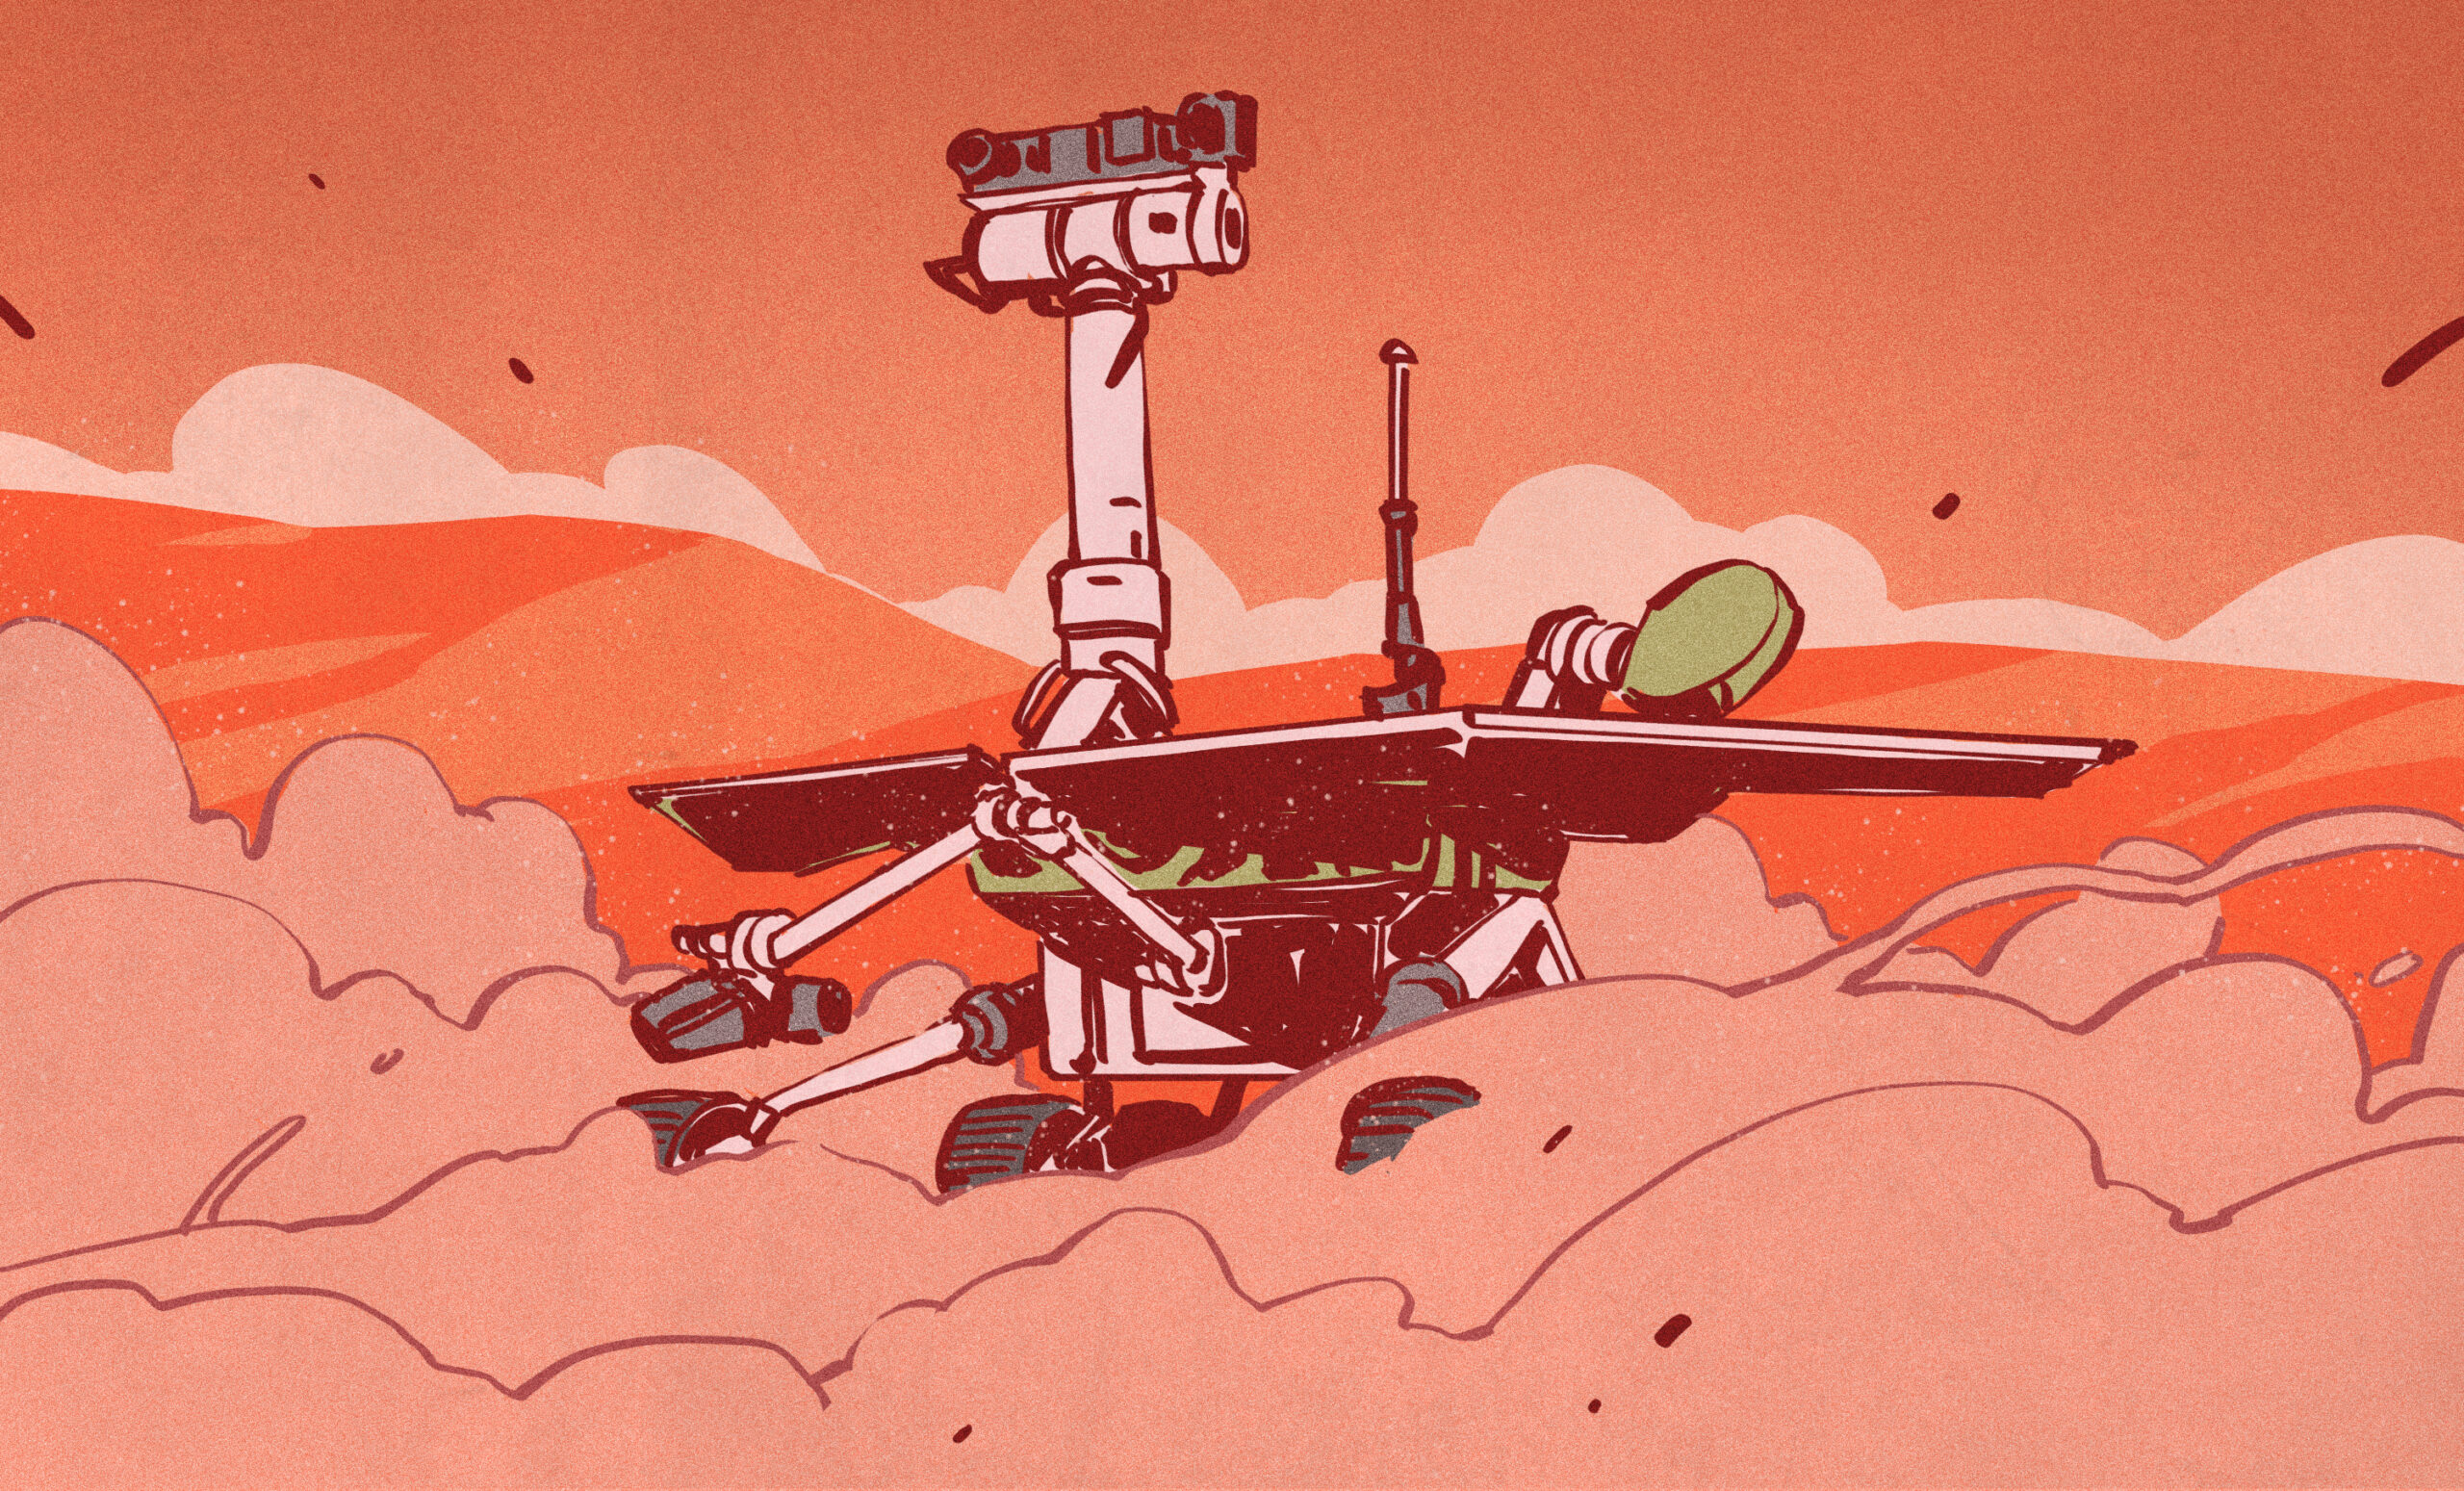 Martian Dust